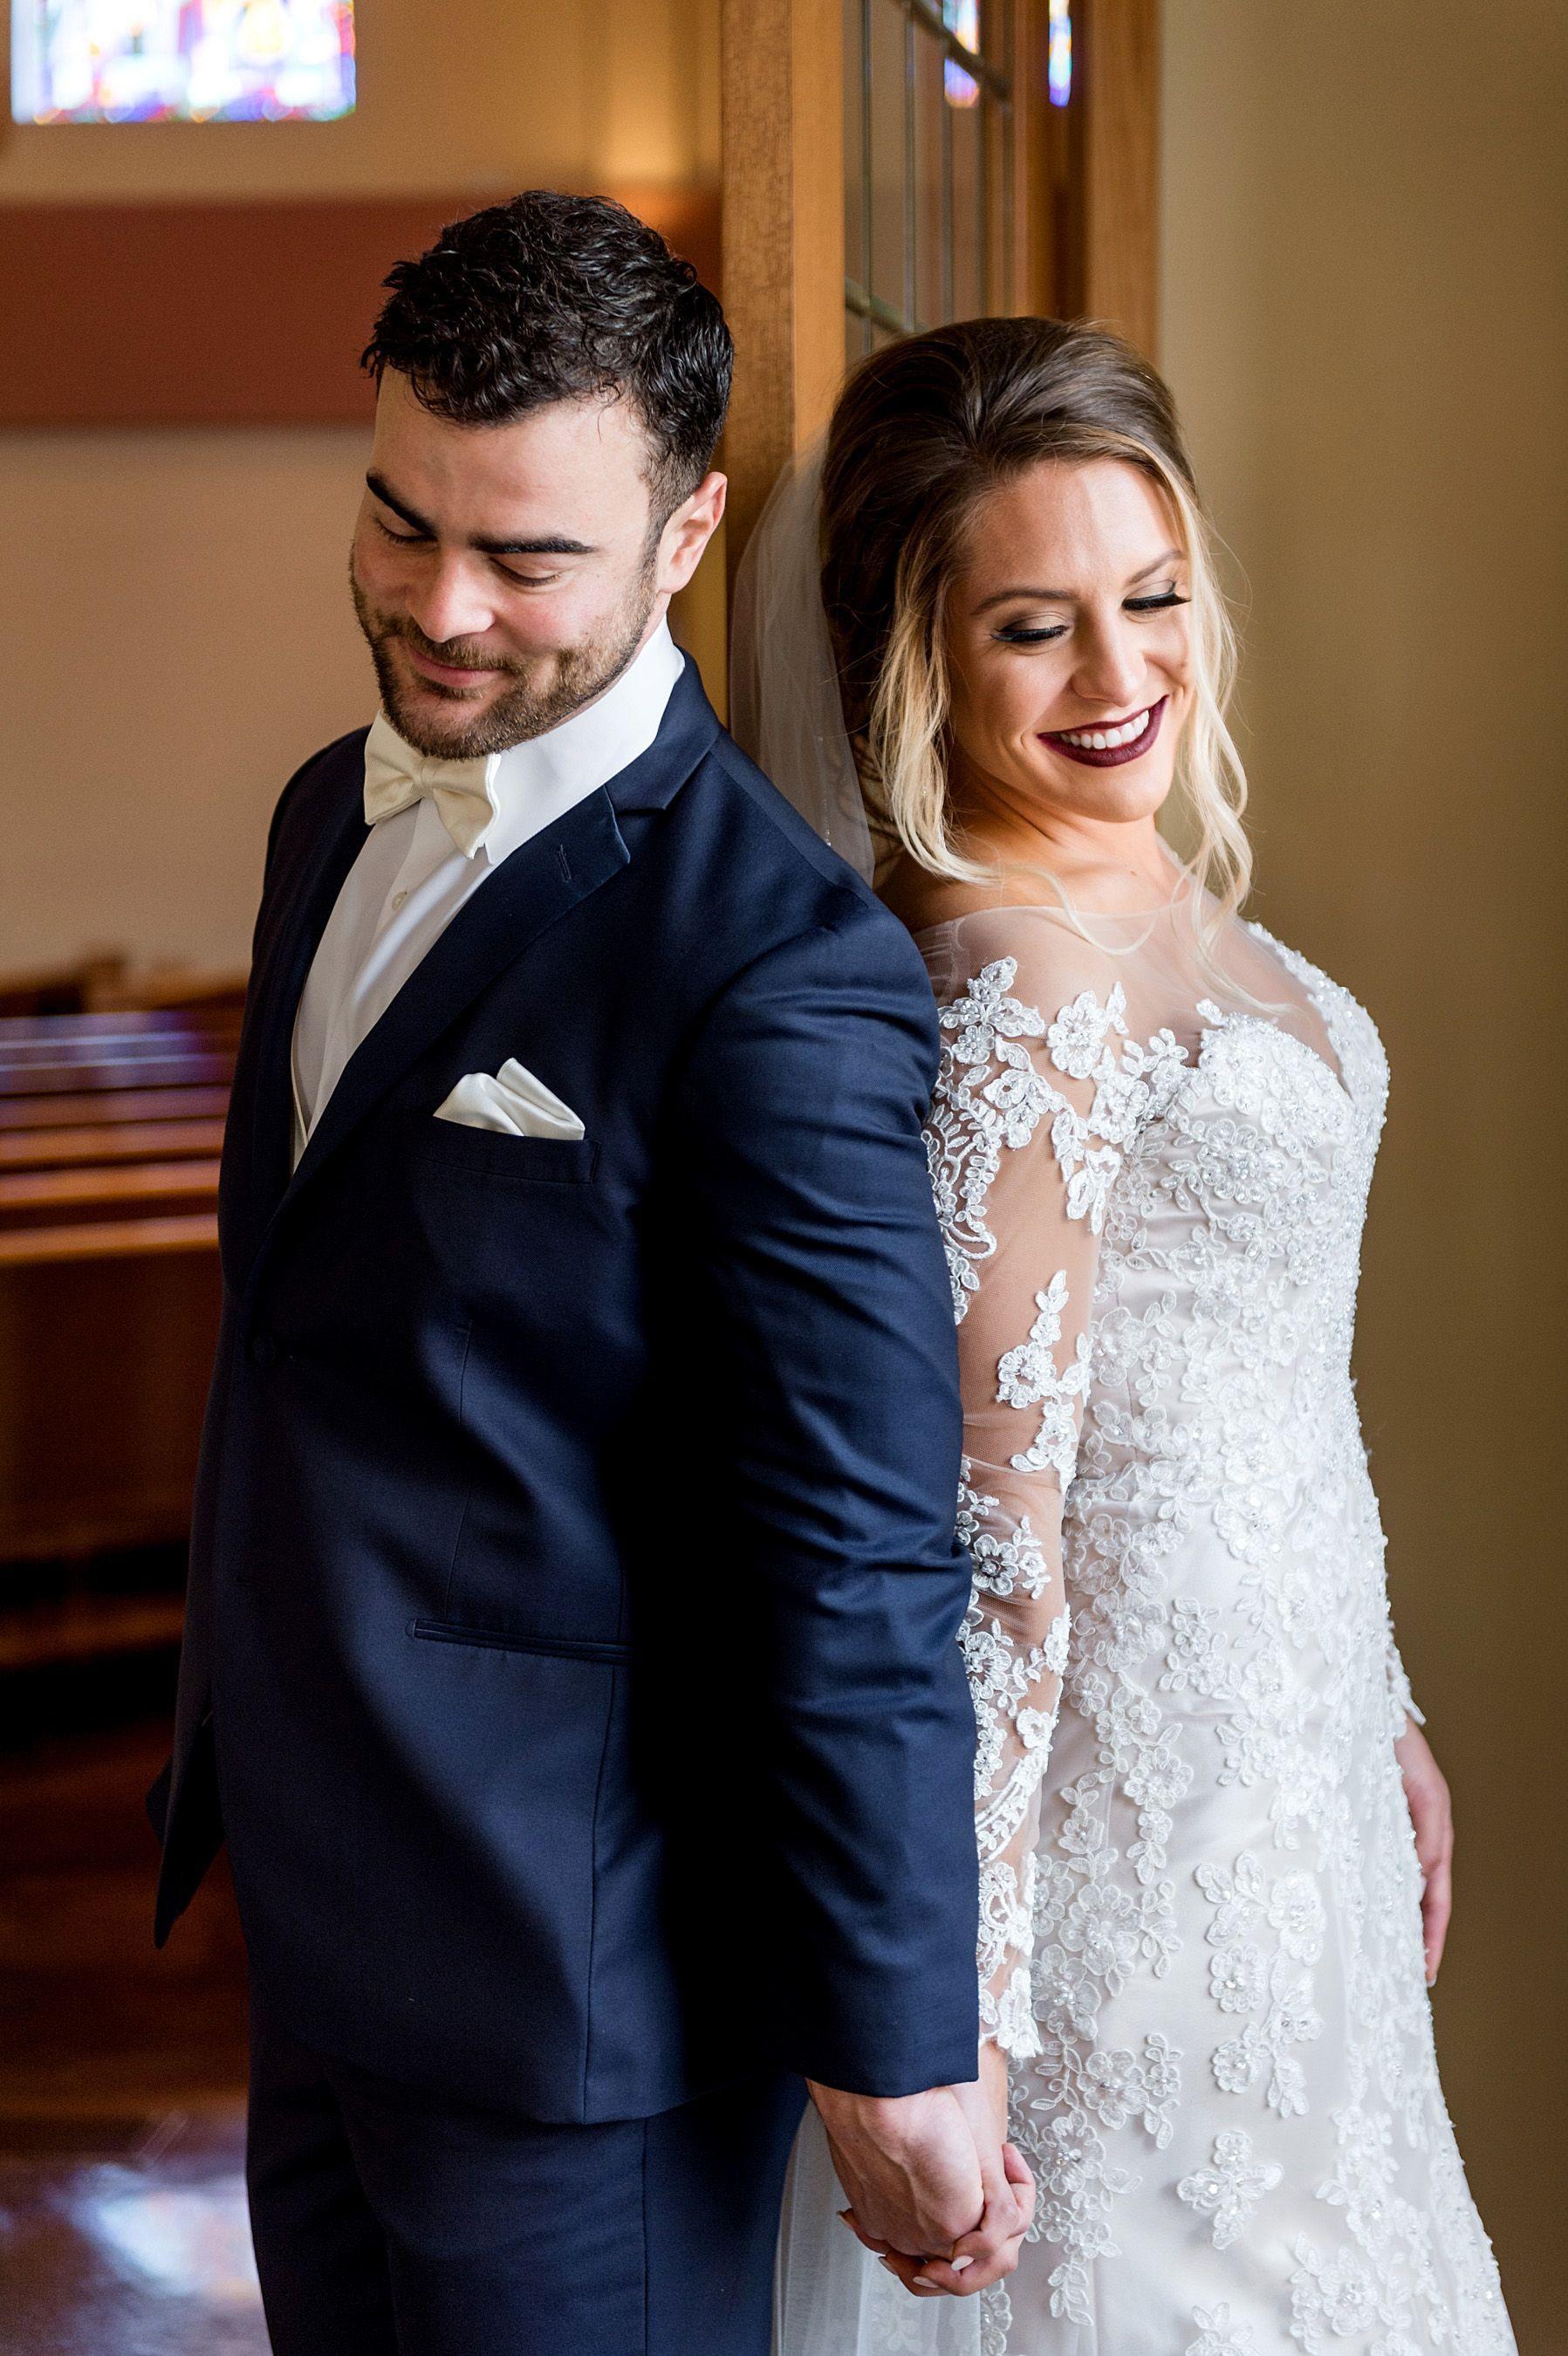 Wedding Photos by Saint Louis Wedding Photographer, Ashley